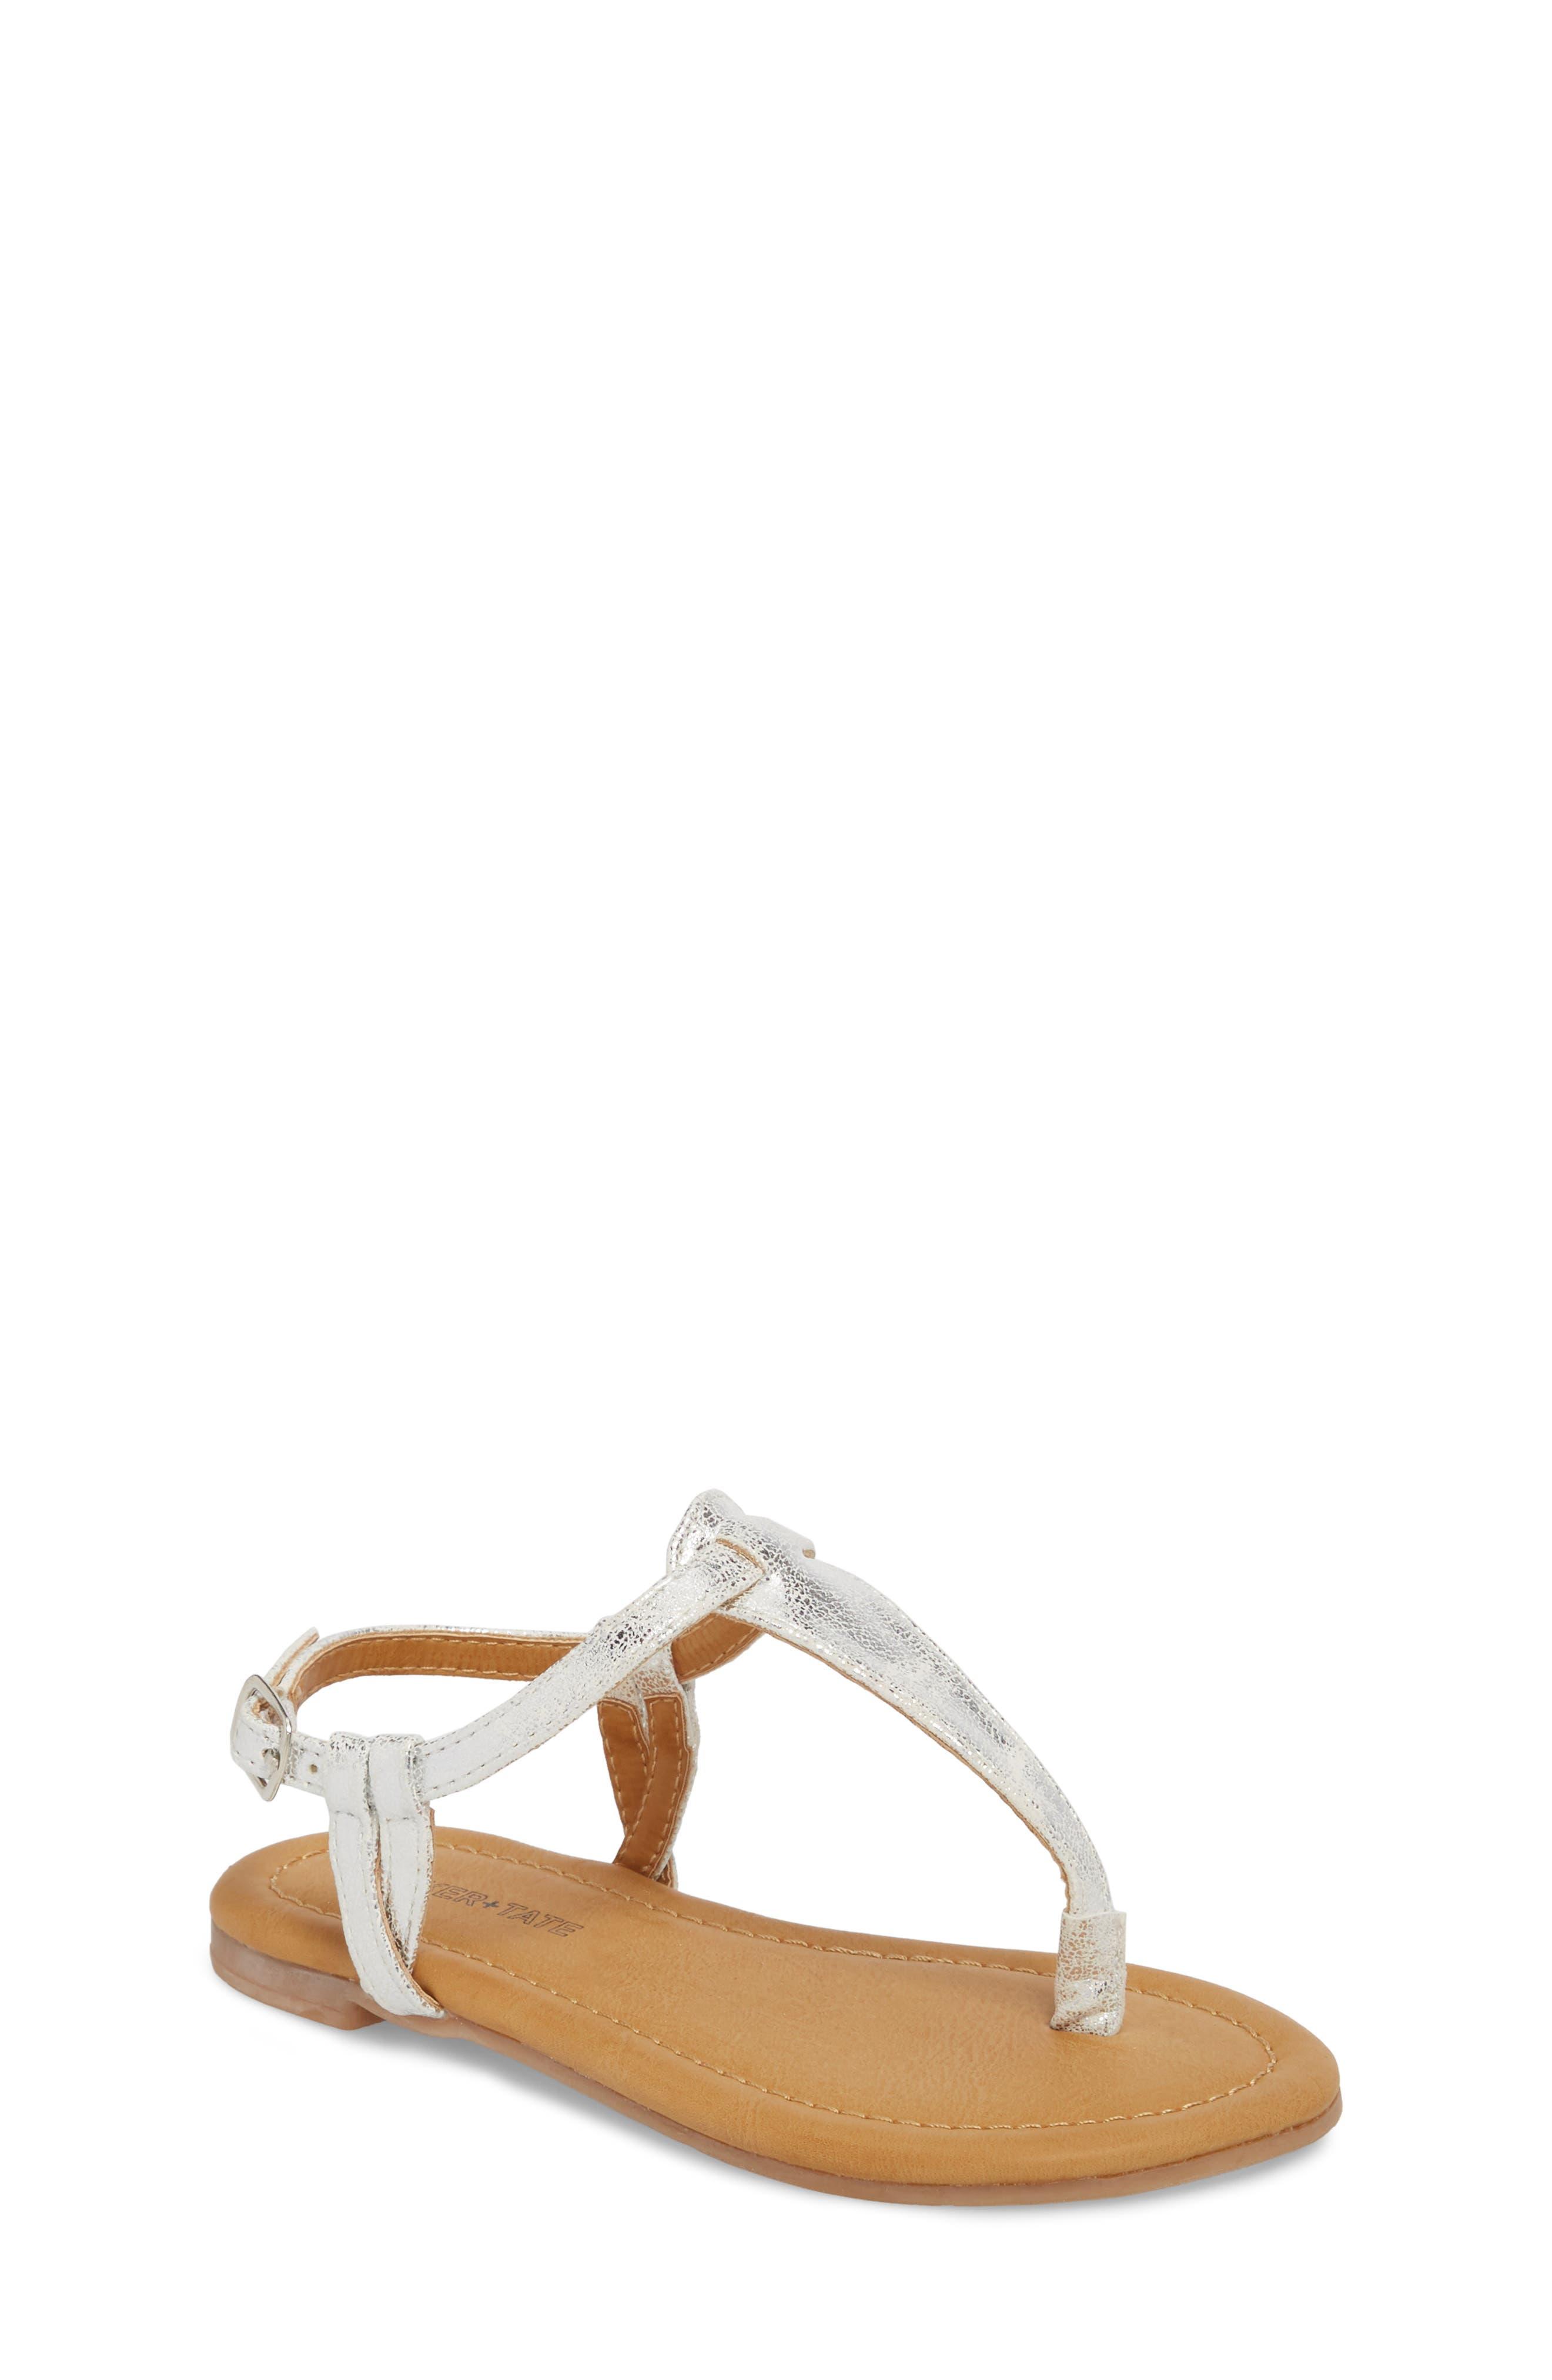 Lizzie Sandal,                             Main thumbnail 1, color,                             White/ Silver Faux Leather